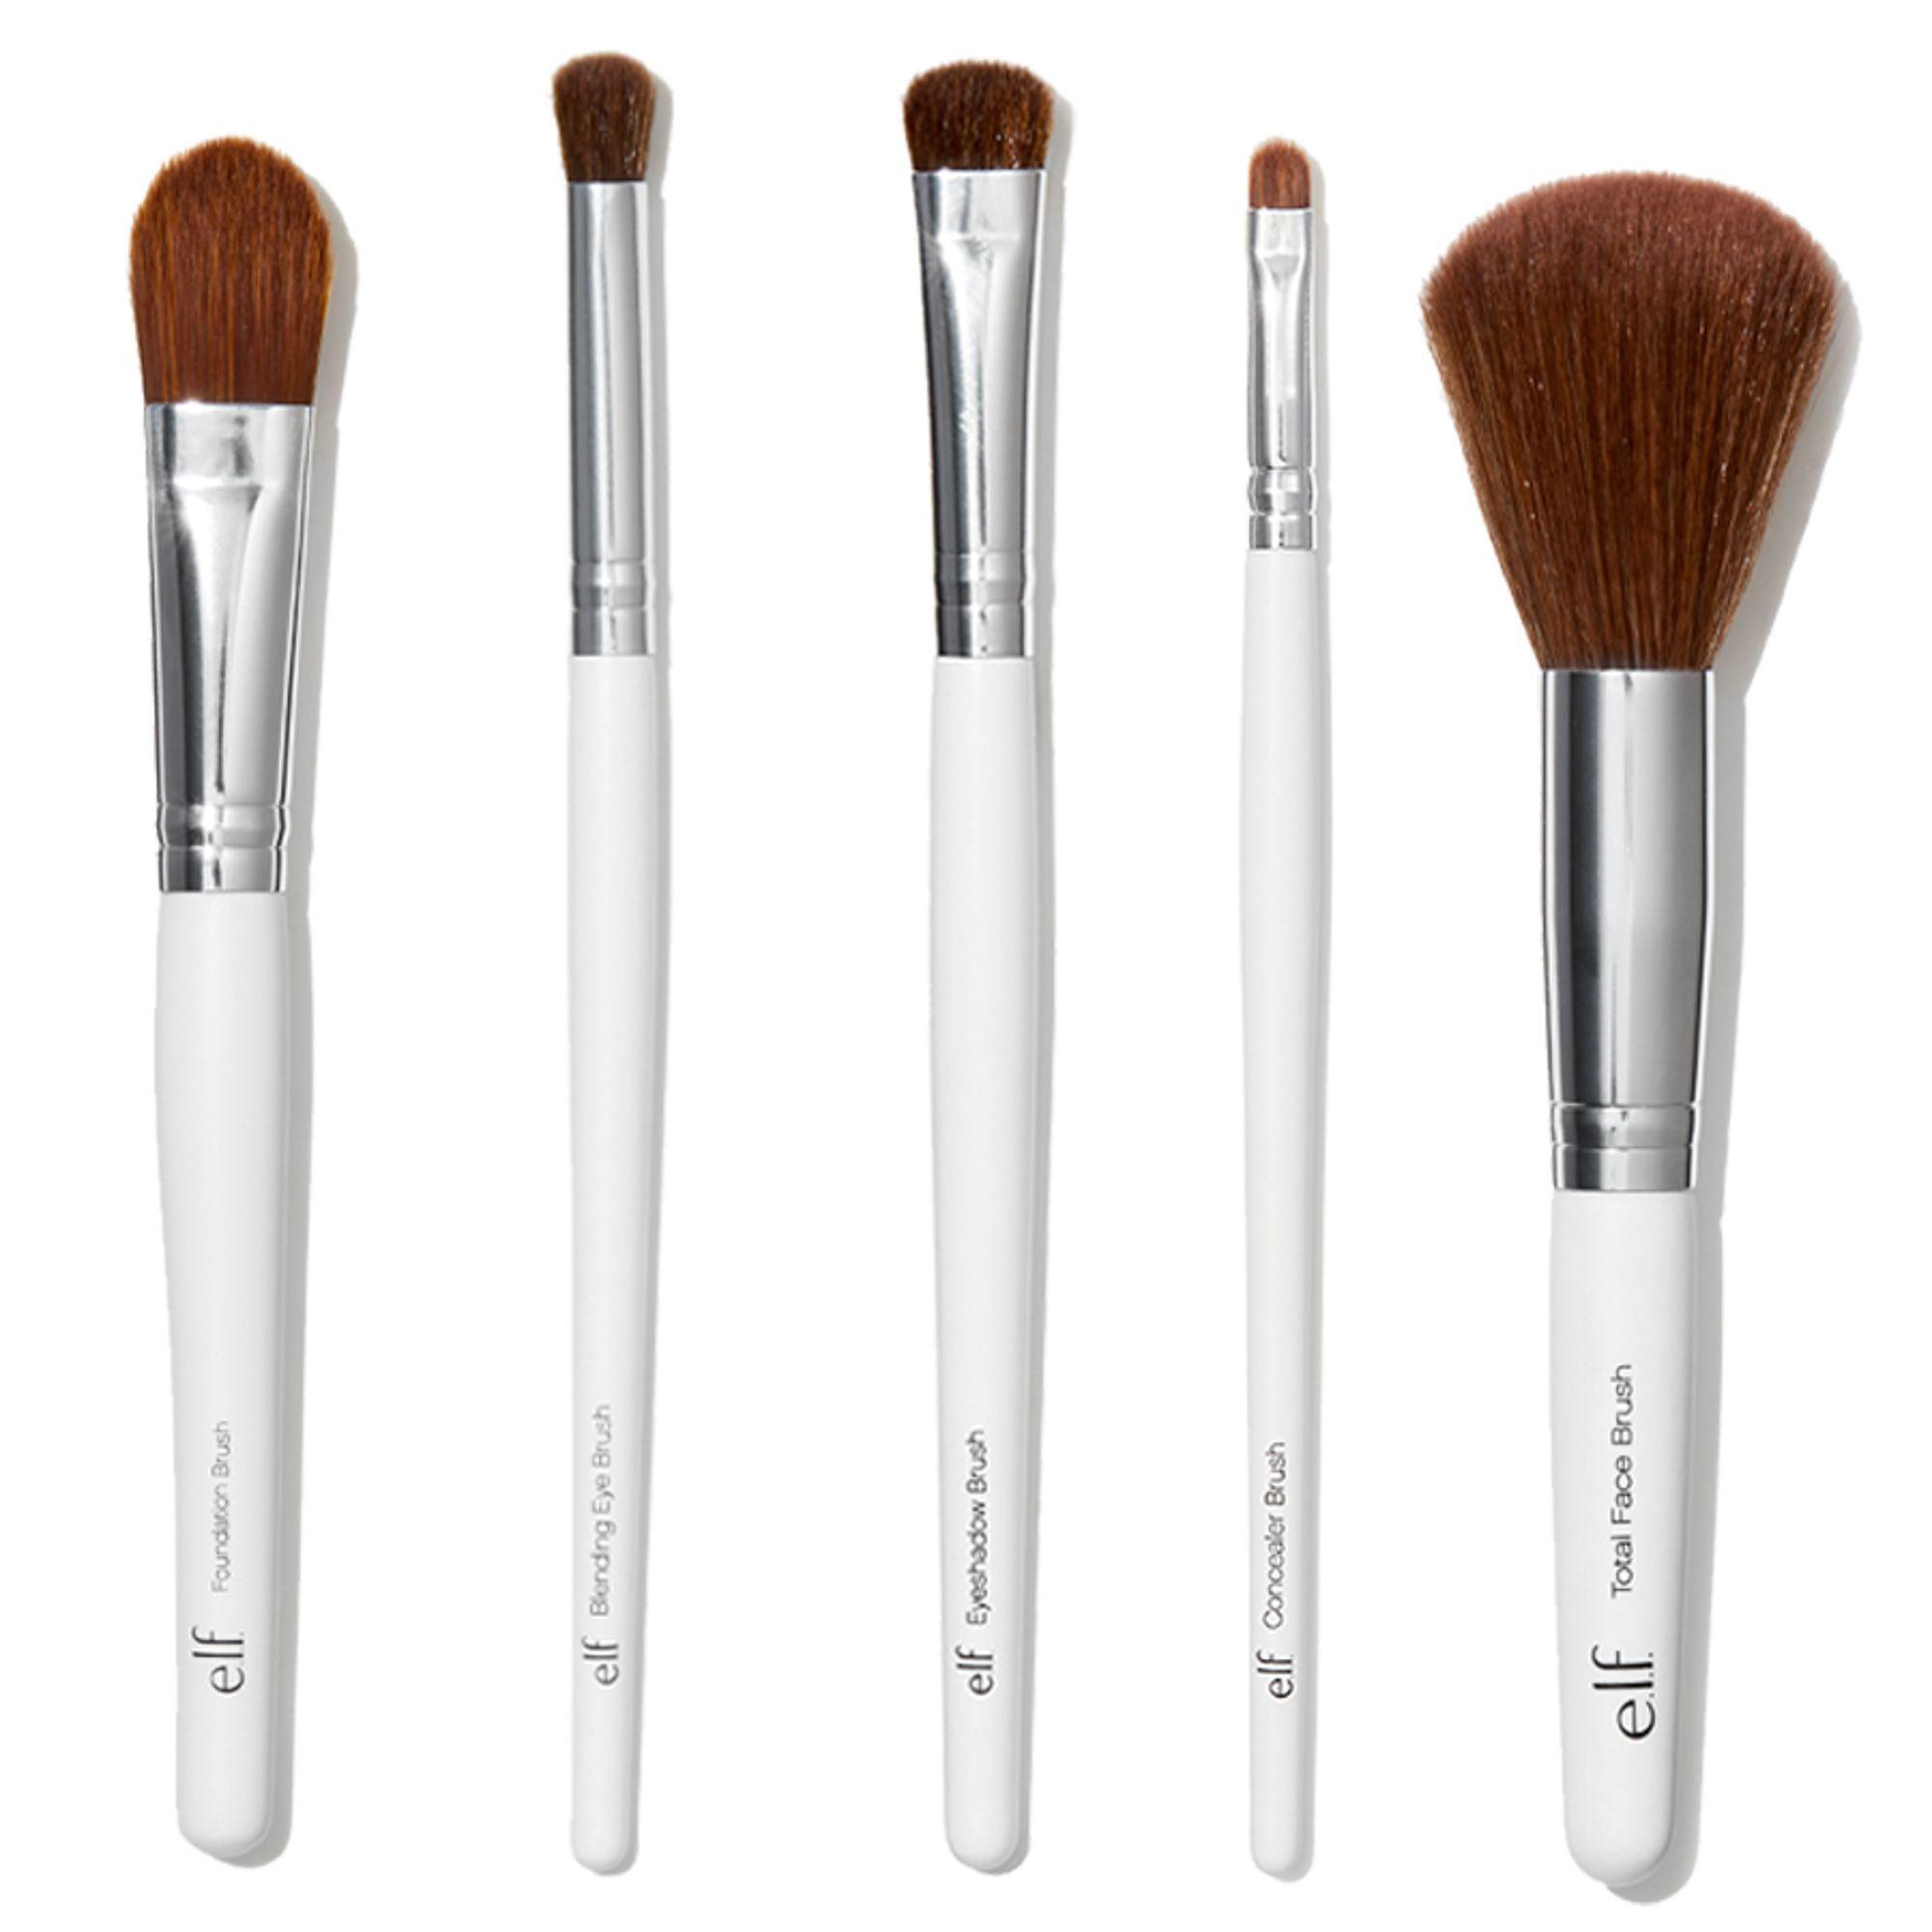 Starter Brush Set e.l.f. Cosmetics Cruelty Free